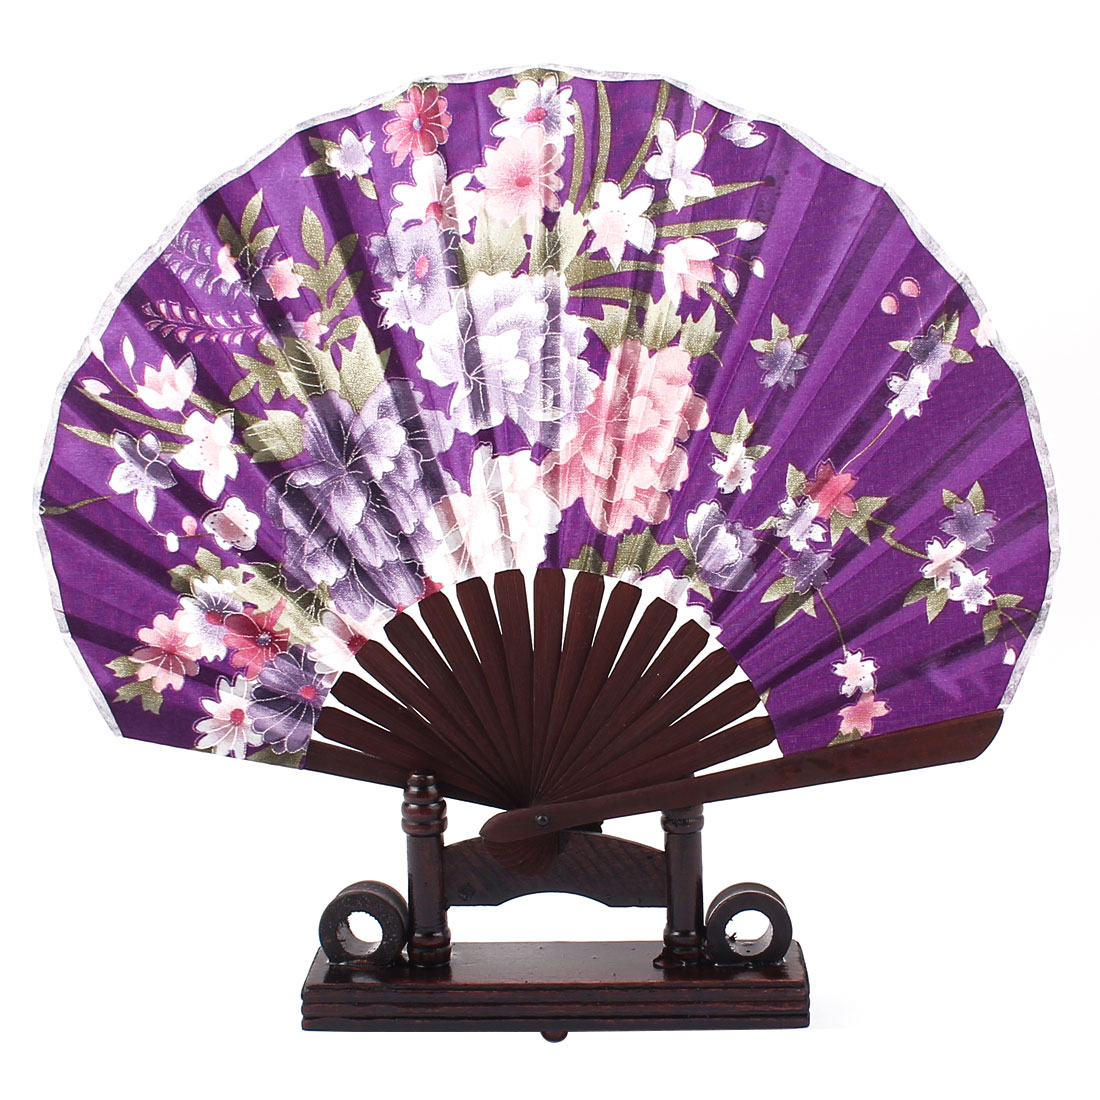 Chinese Wedding Party Favor Peony Print Wood Folding Hand Fan Purple Pink w Holder